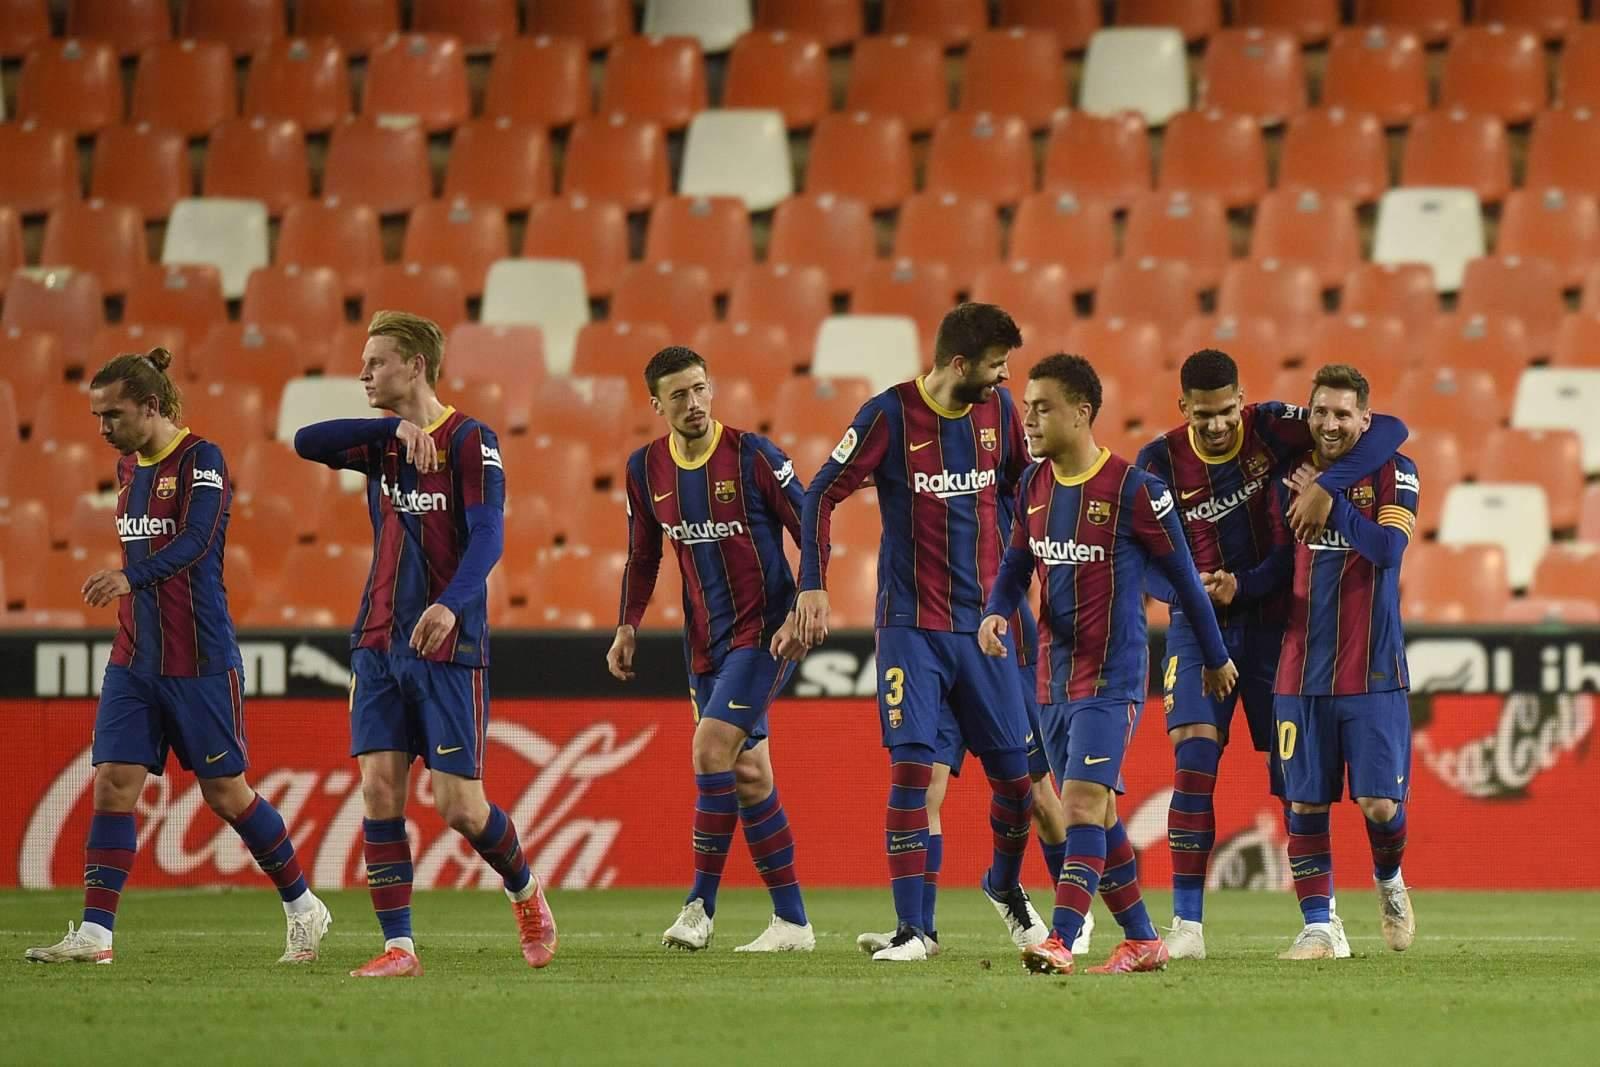 «Леванте» - «Барселона»: прямая трансляция, составы, онлайн - 2:3